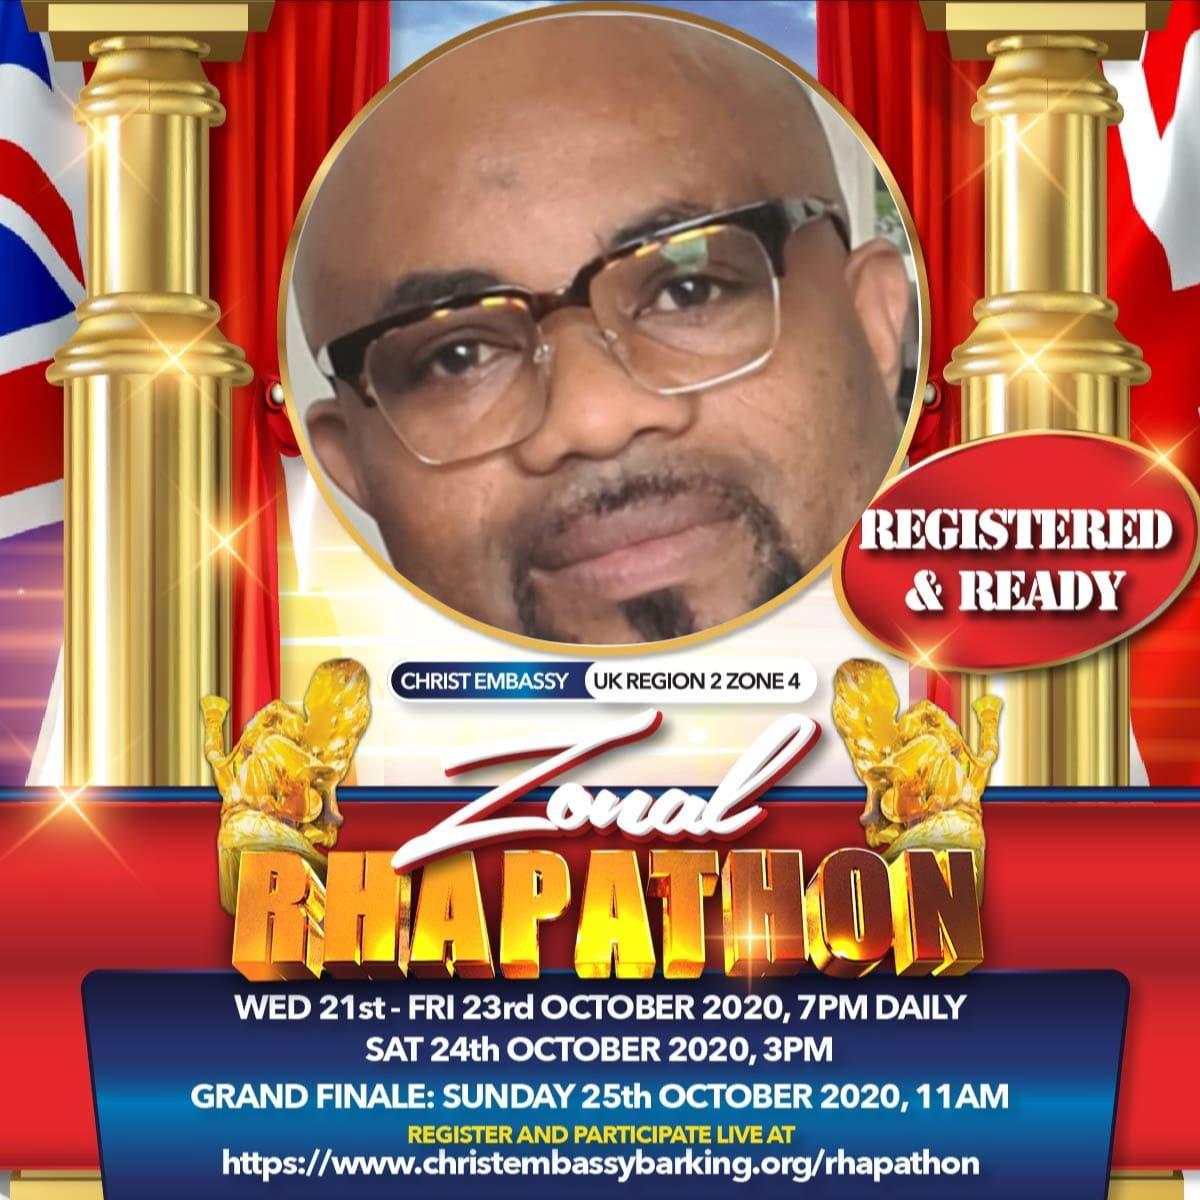 ⭐️UKR2Z4 RHAPATHON 21st-25th of October